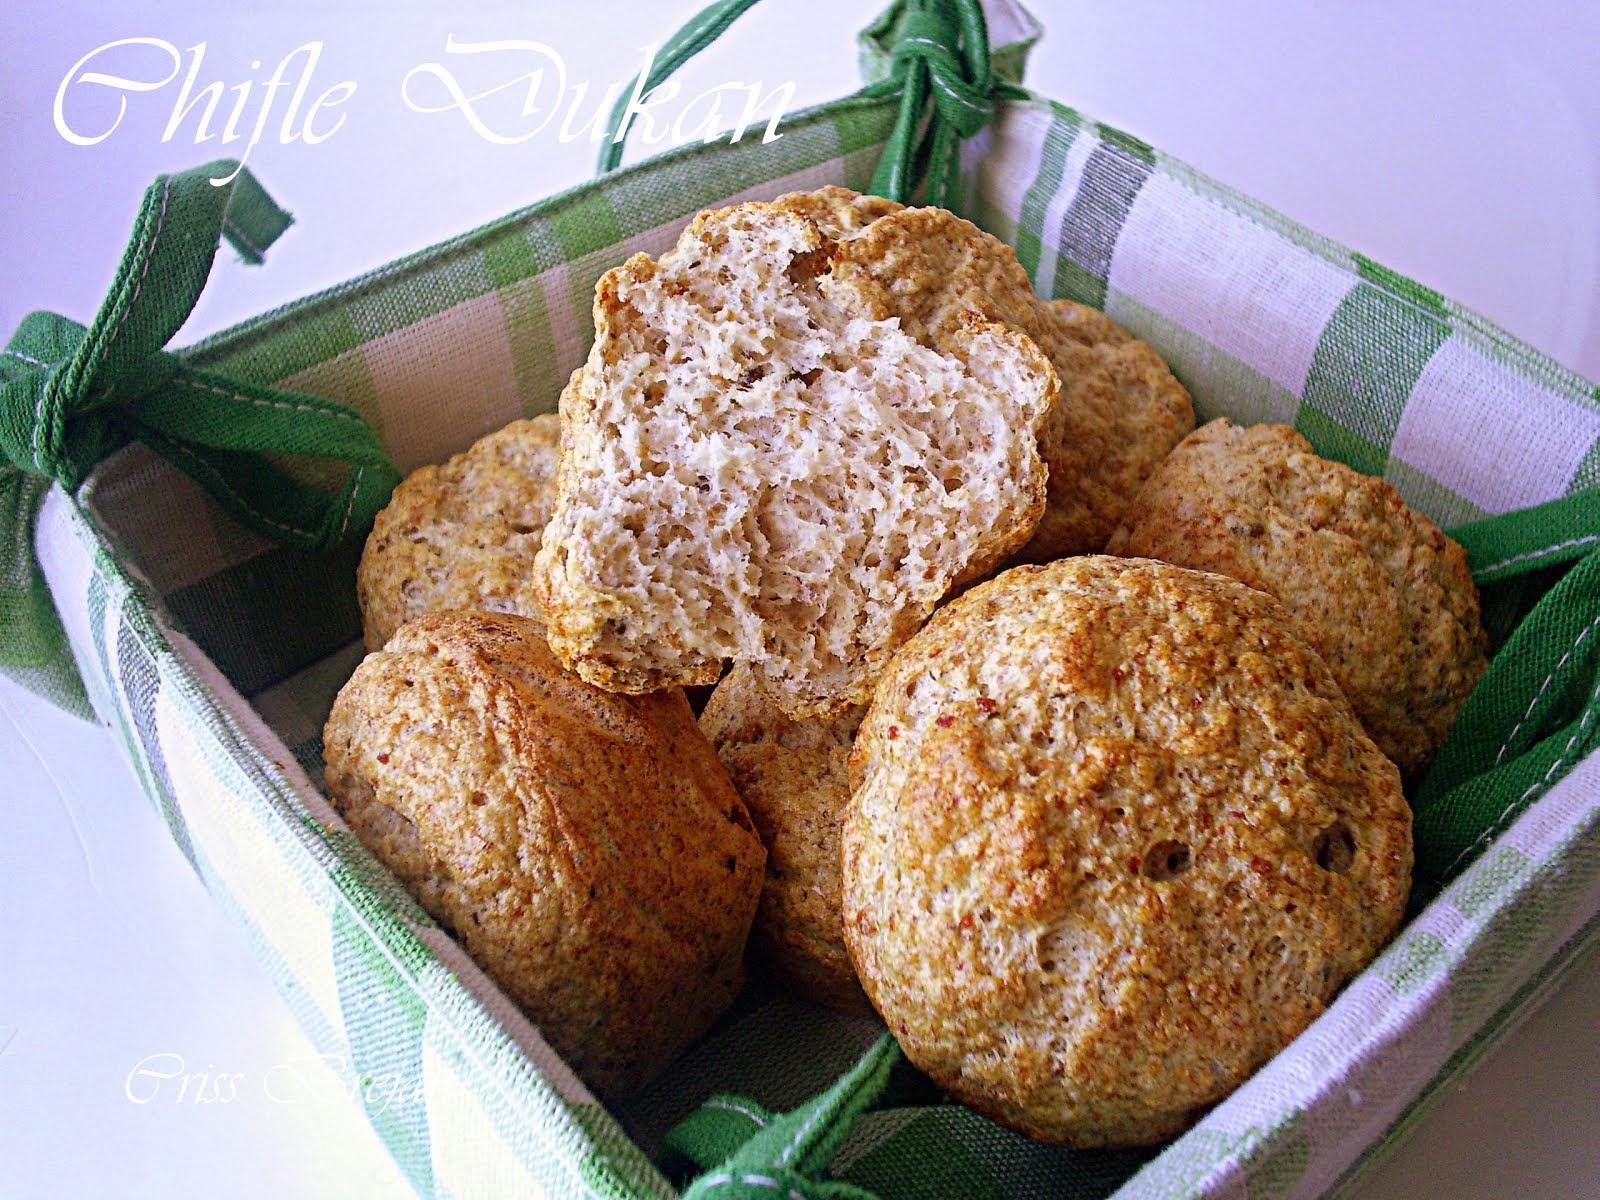 Chifle/turte/muffins Dukan